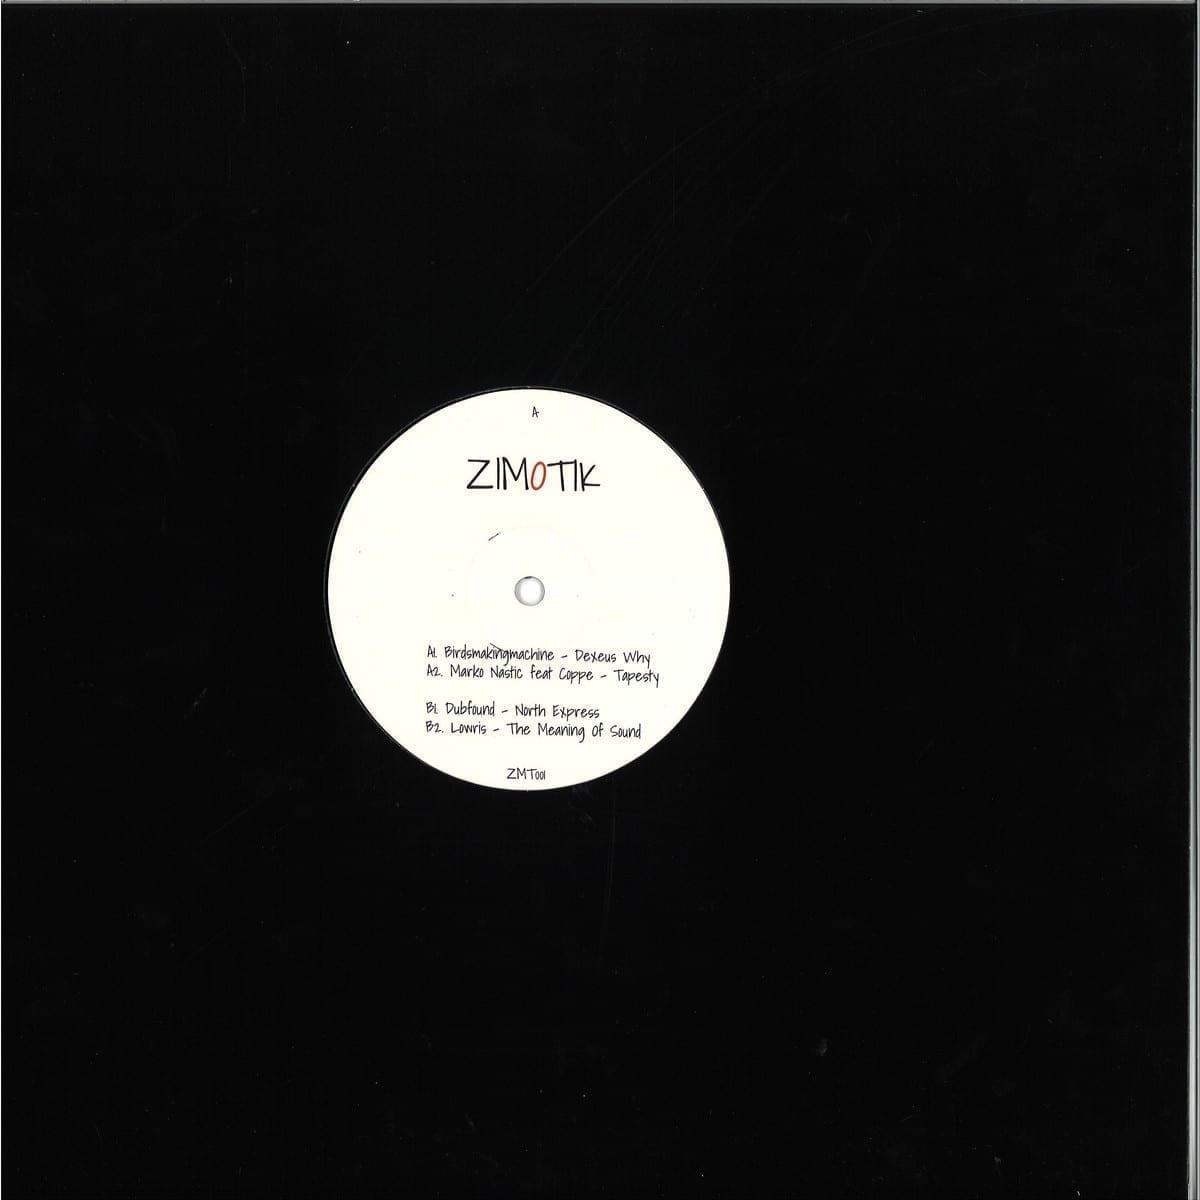 Various Artists - ZMT 001 [Zimotik] back